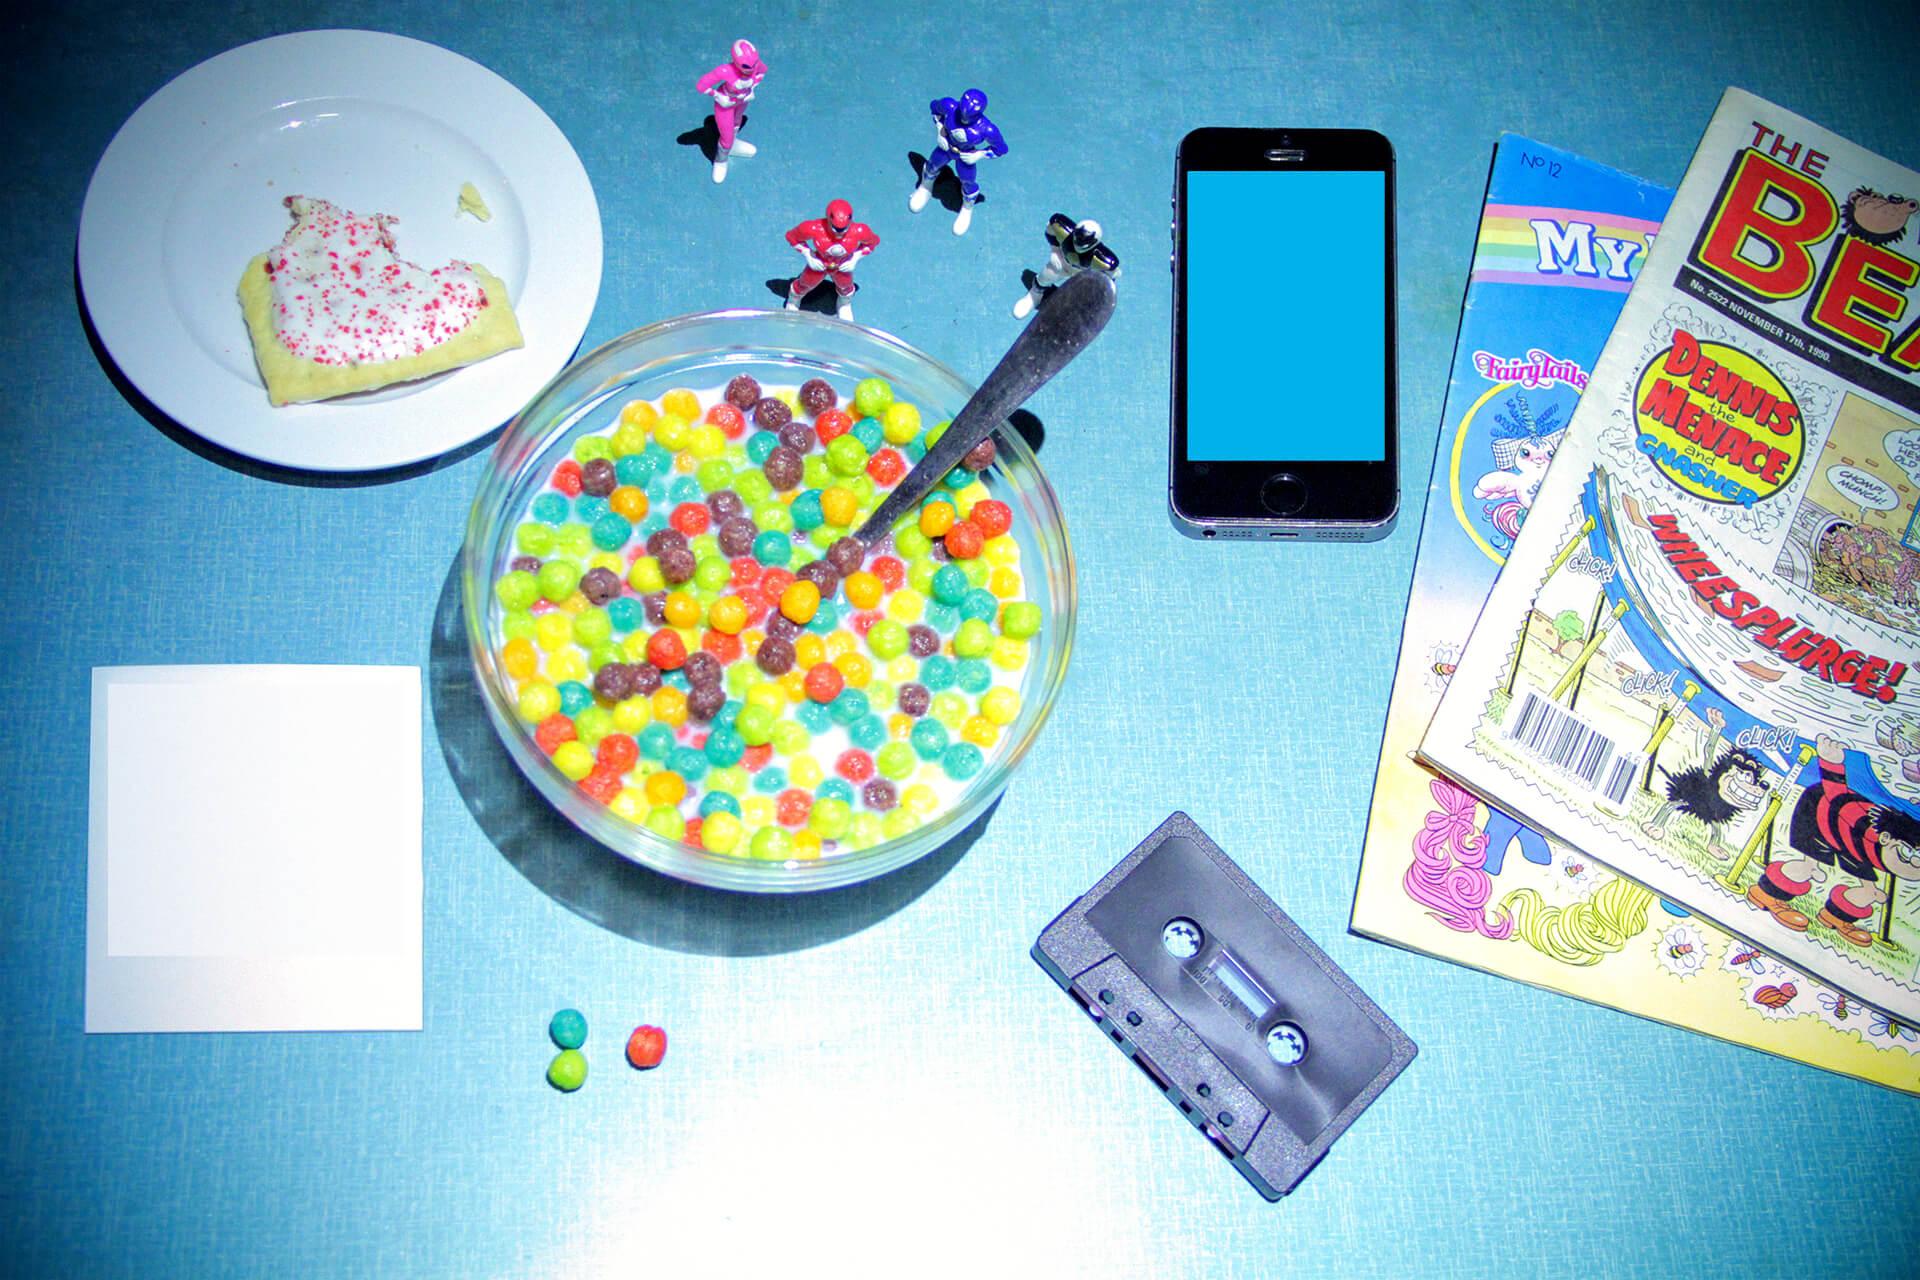 Cereal Killer-London 00